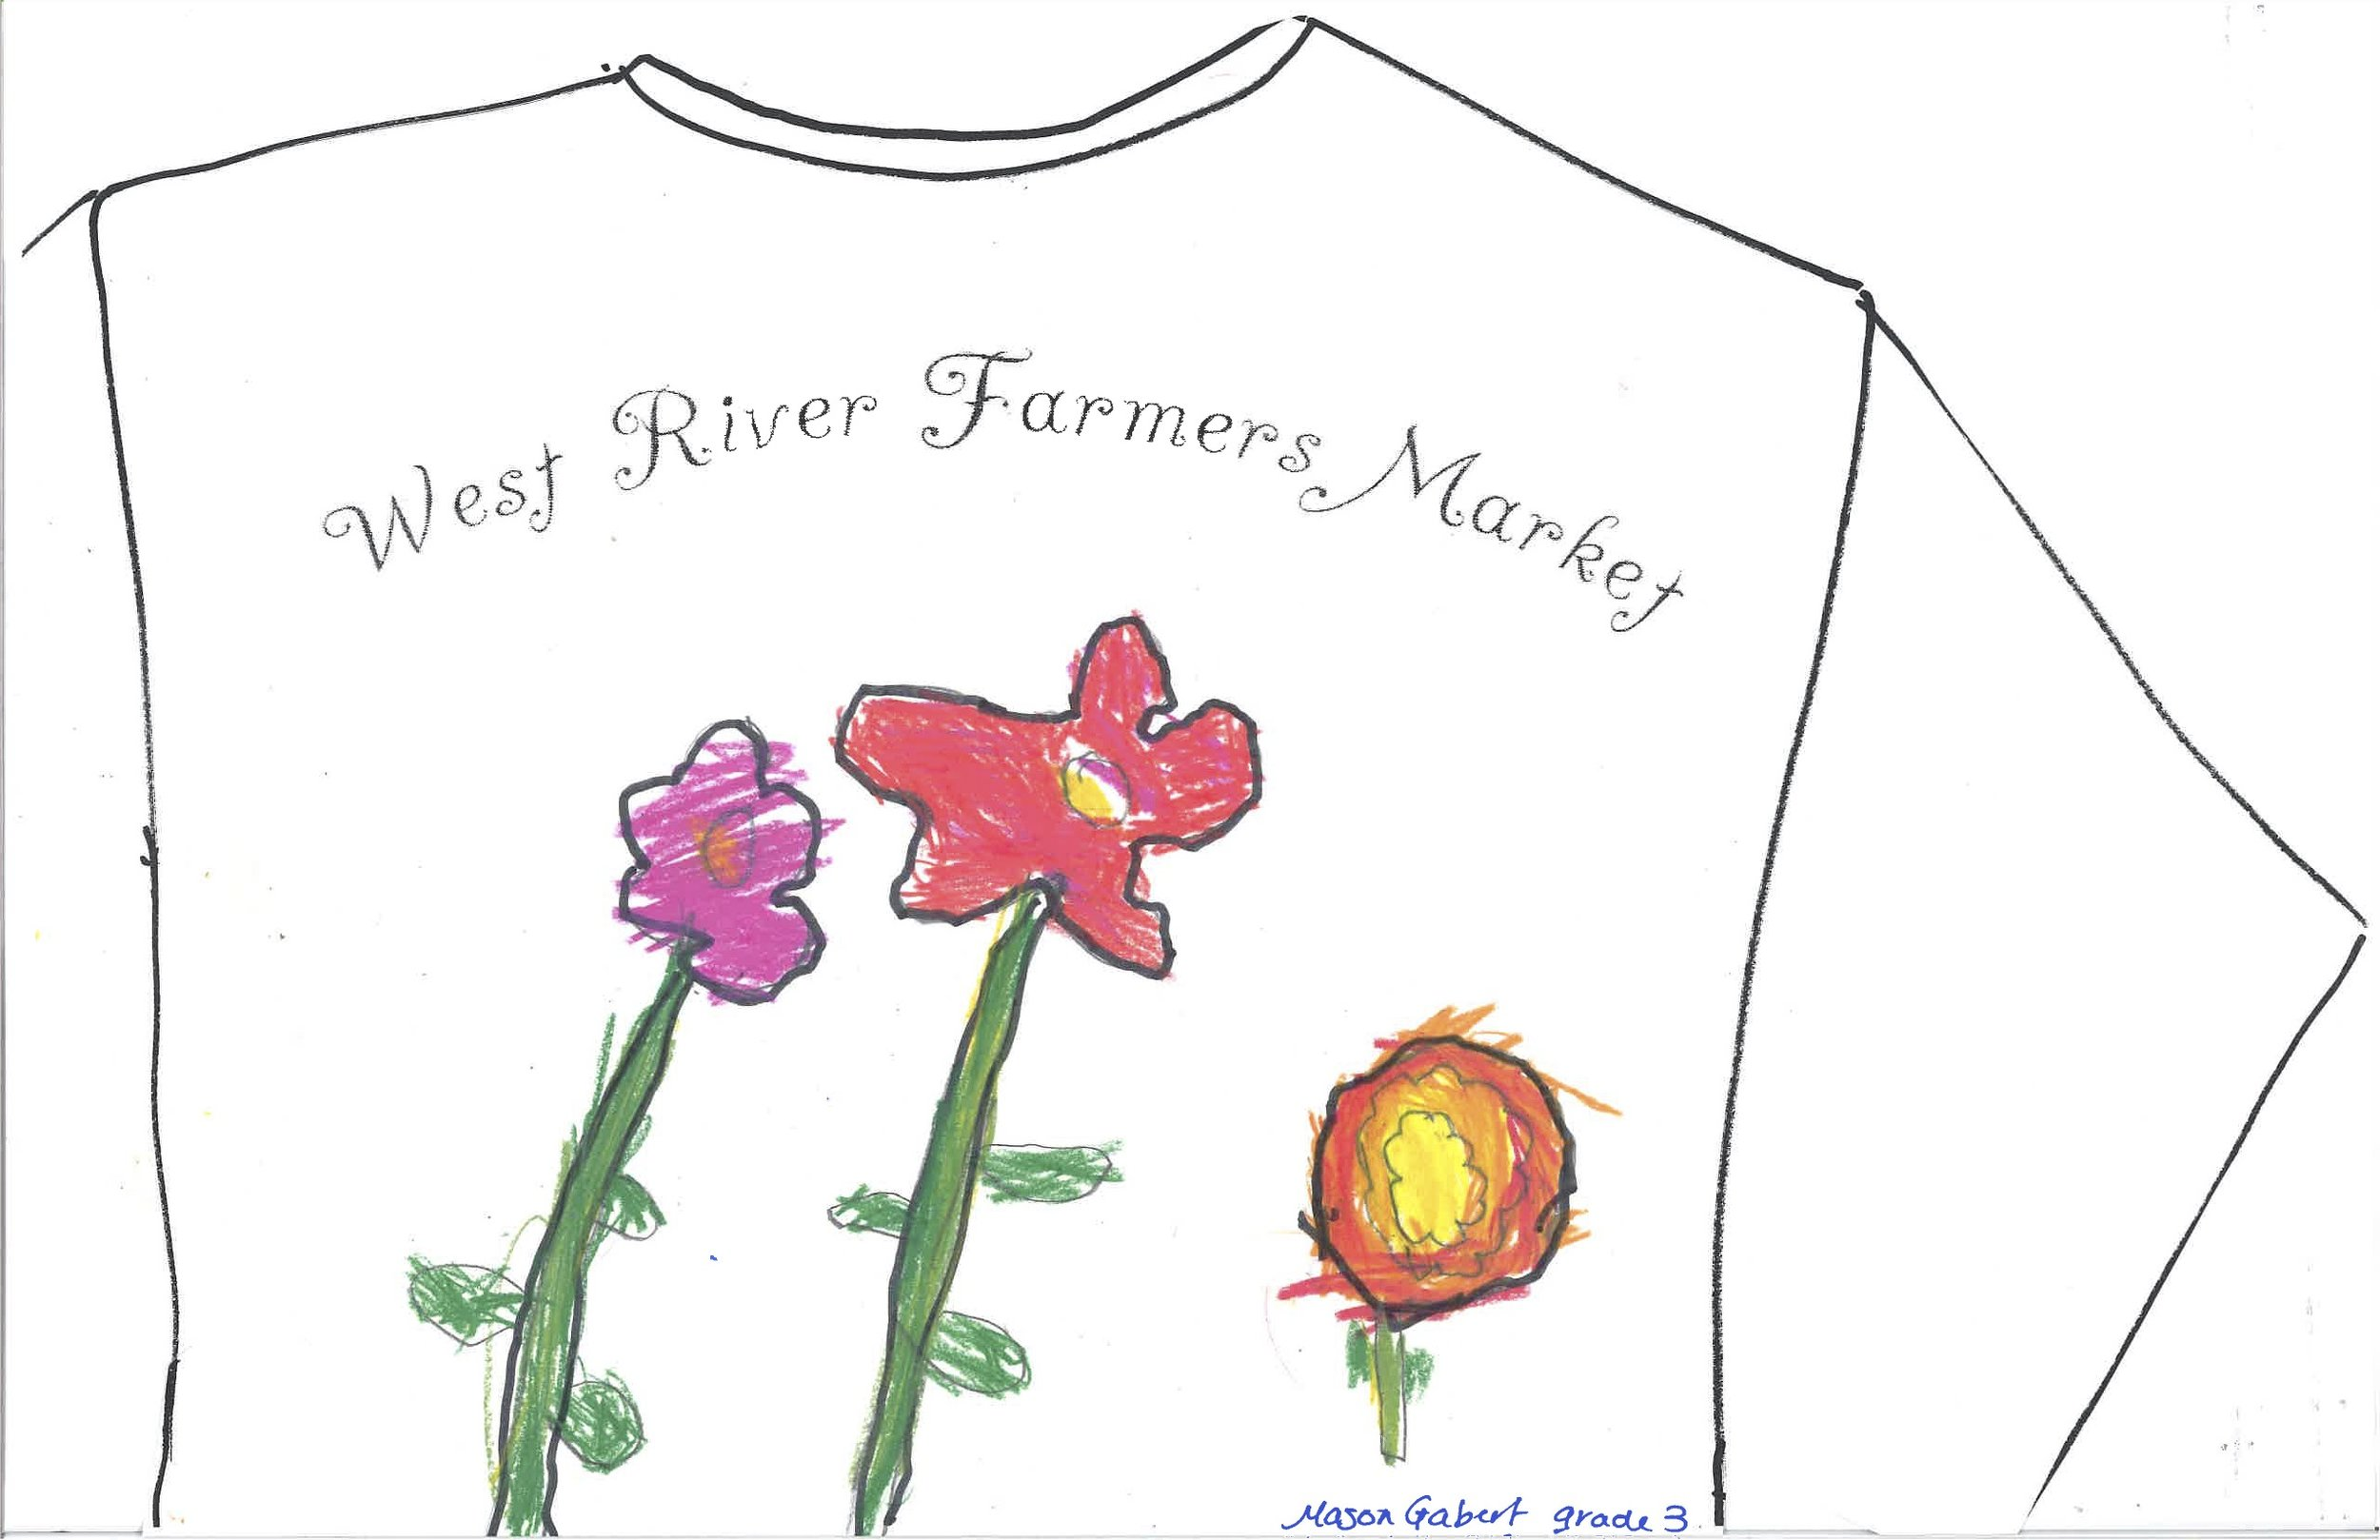 Flood Brook T Shirt Design 19.jpg